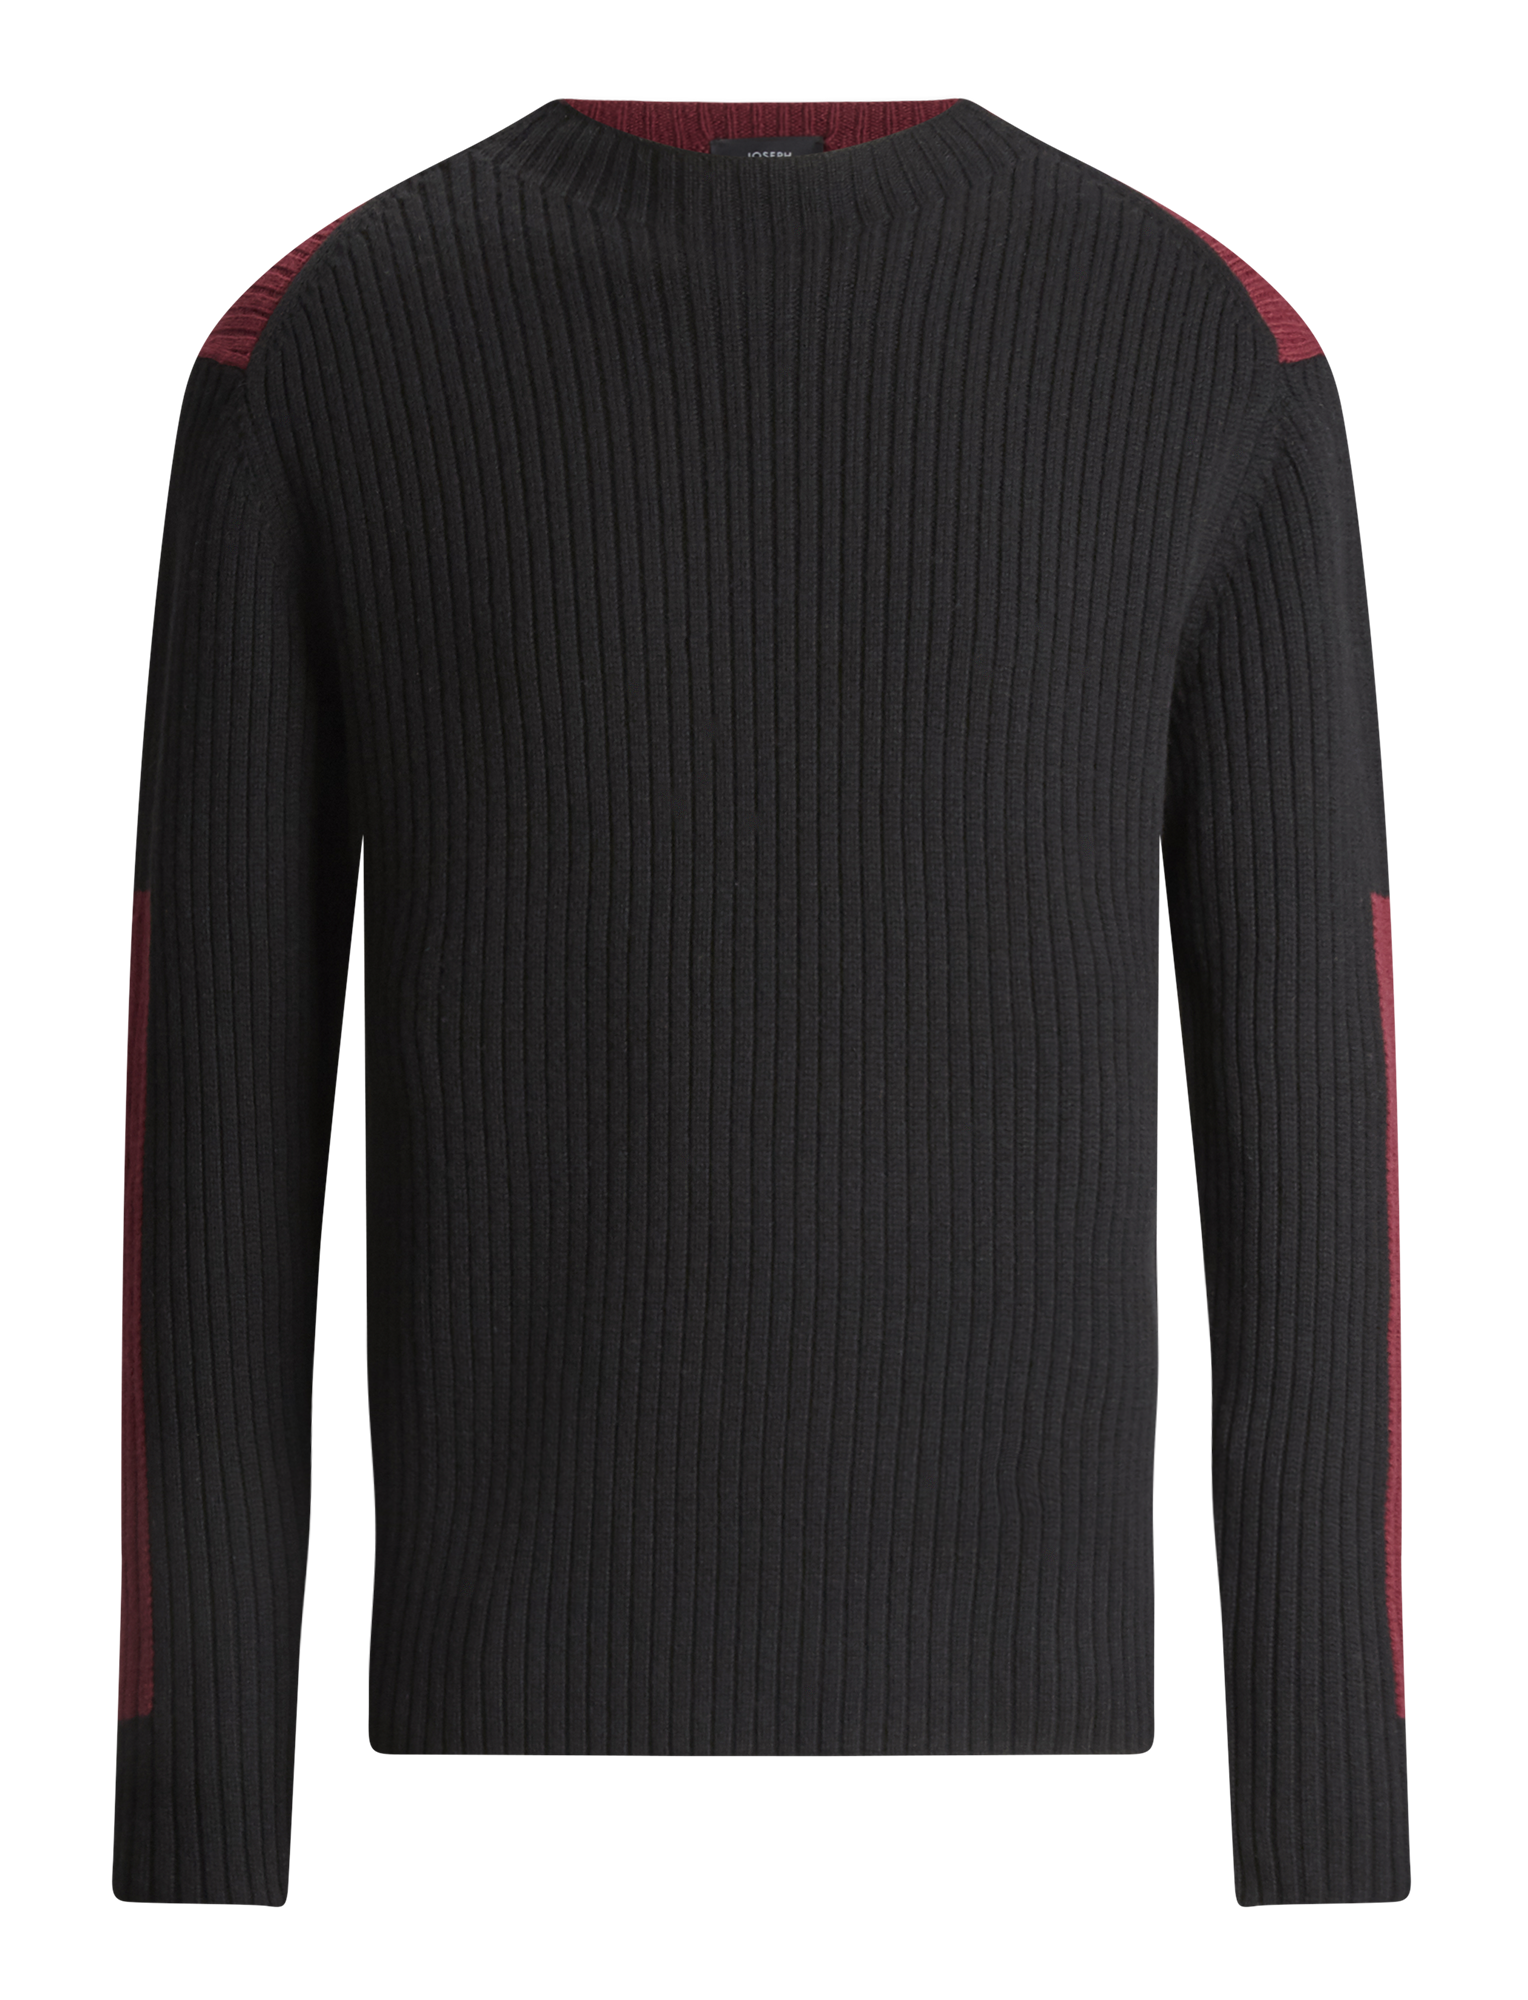 Joseph, Rib Sweater Soft Wool Knitwear, in BLACK